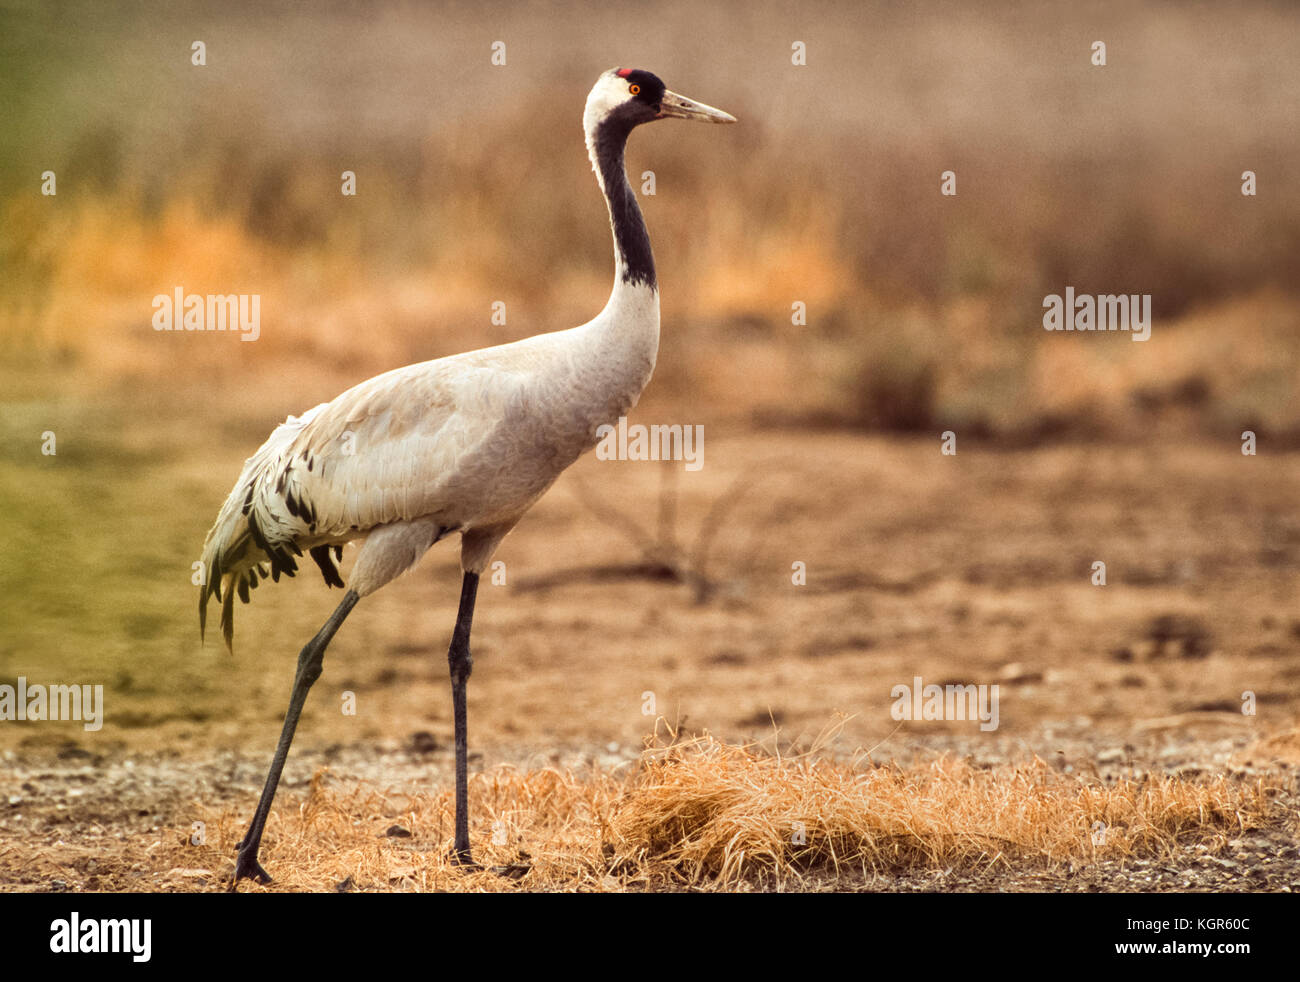 Common Crane, (Grus grus), Velavadar National Park, Gujarat, India - Stock Image